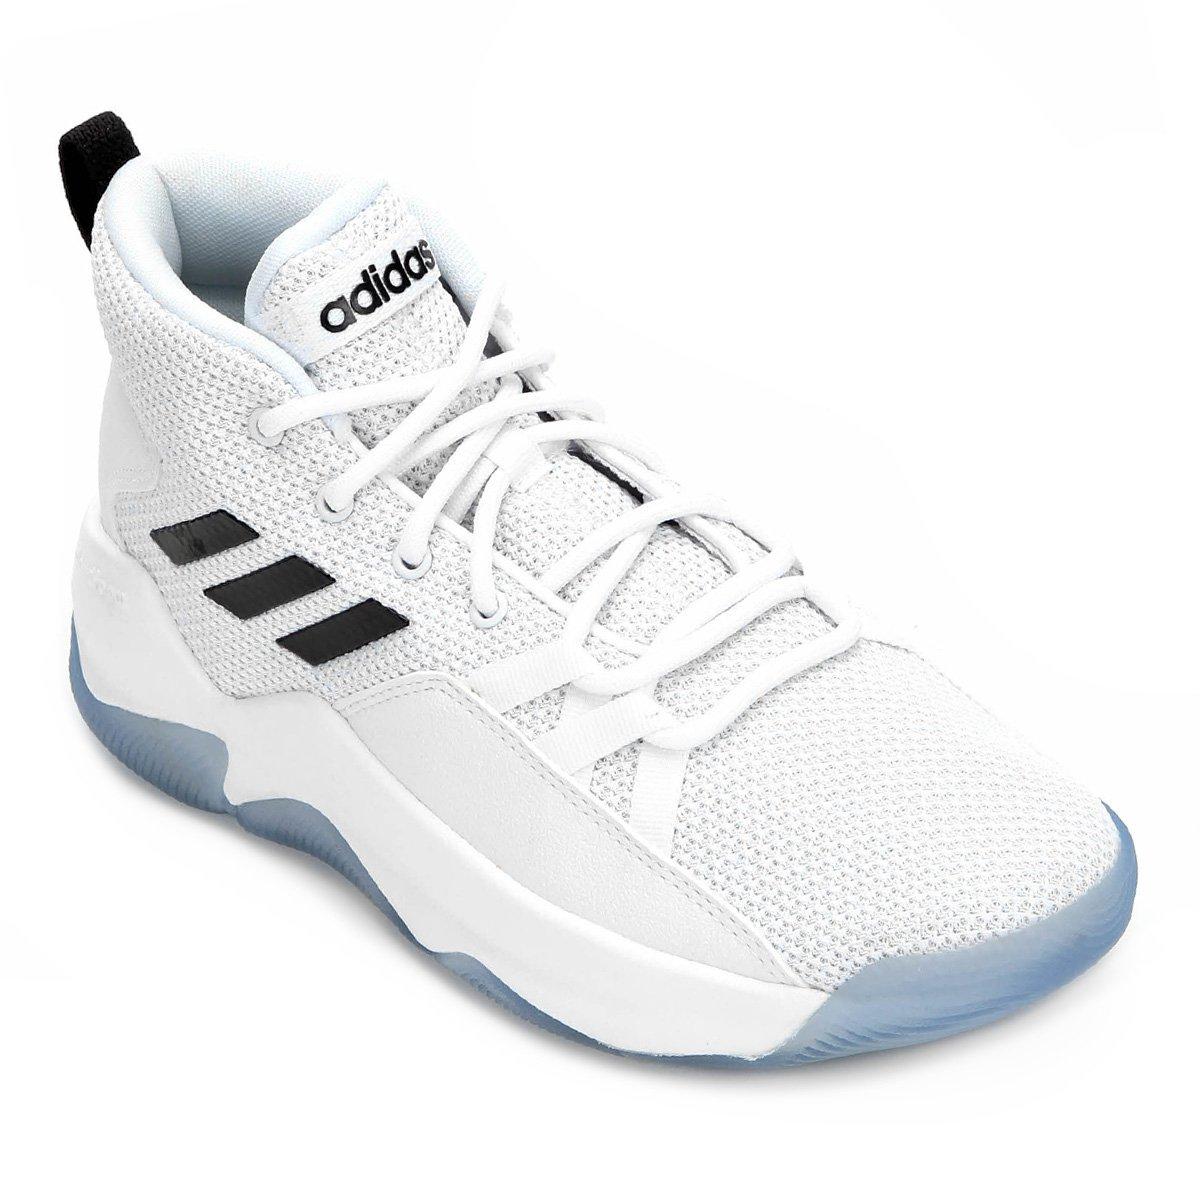 c8500be1 Tênis Adidas Concrete Adt Masculino | Loja NBA